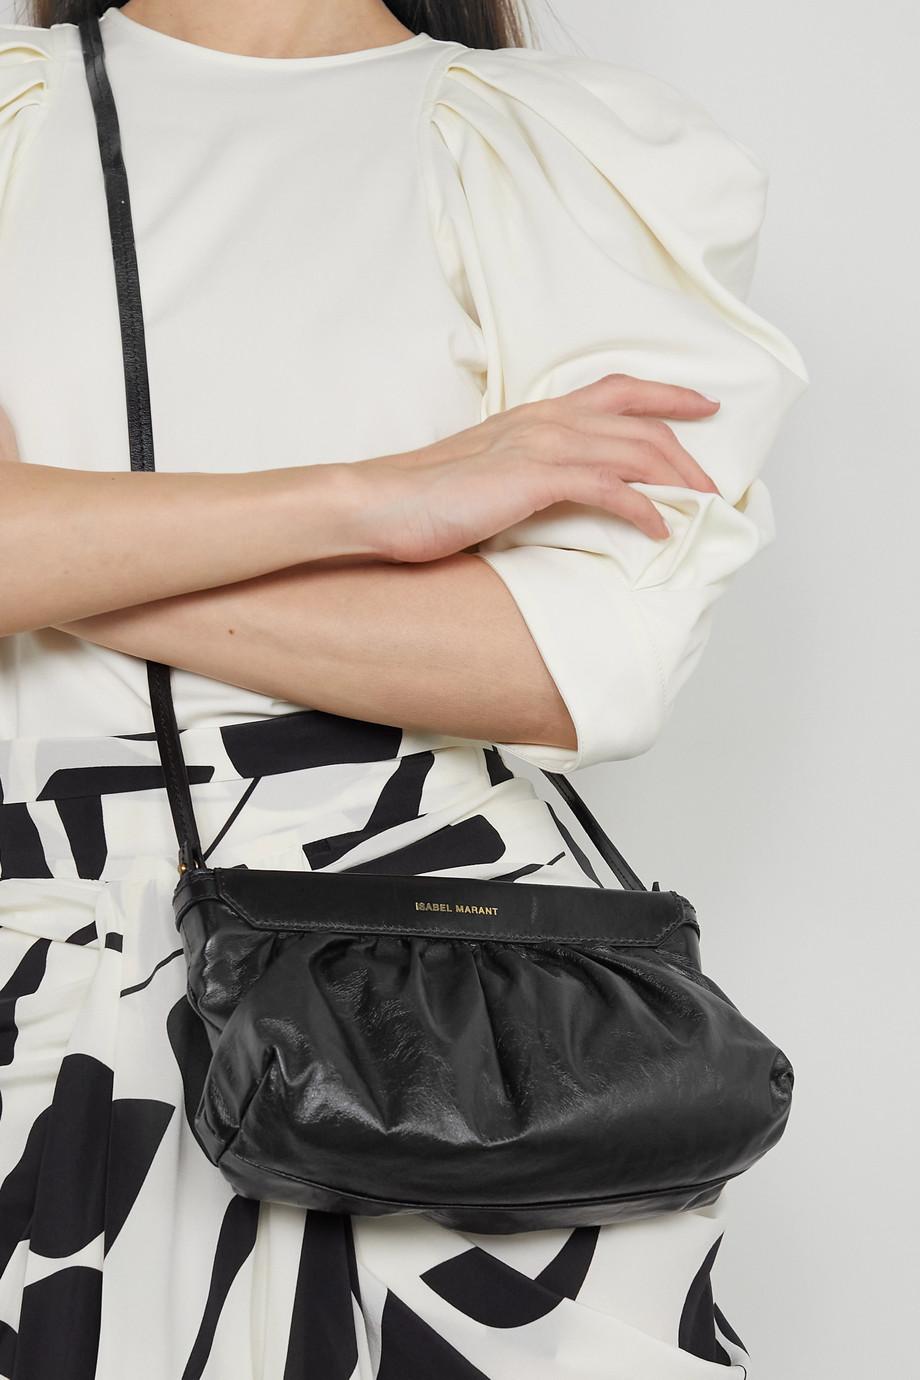 Isabel Marant Luzes gathered leather shoulder bag